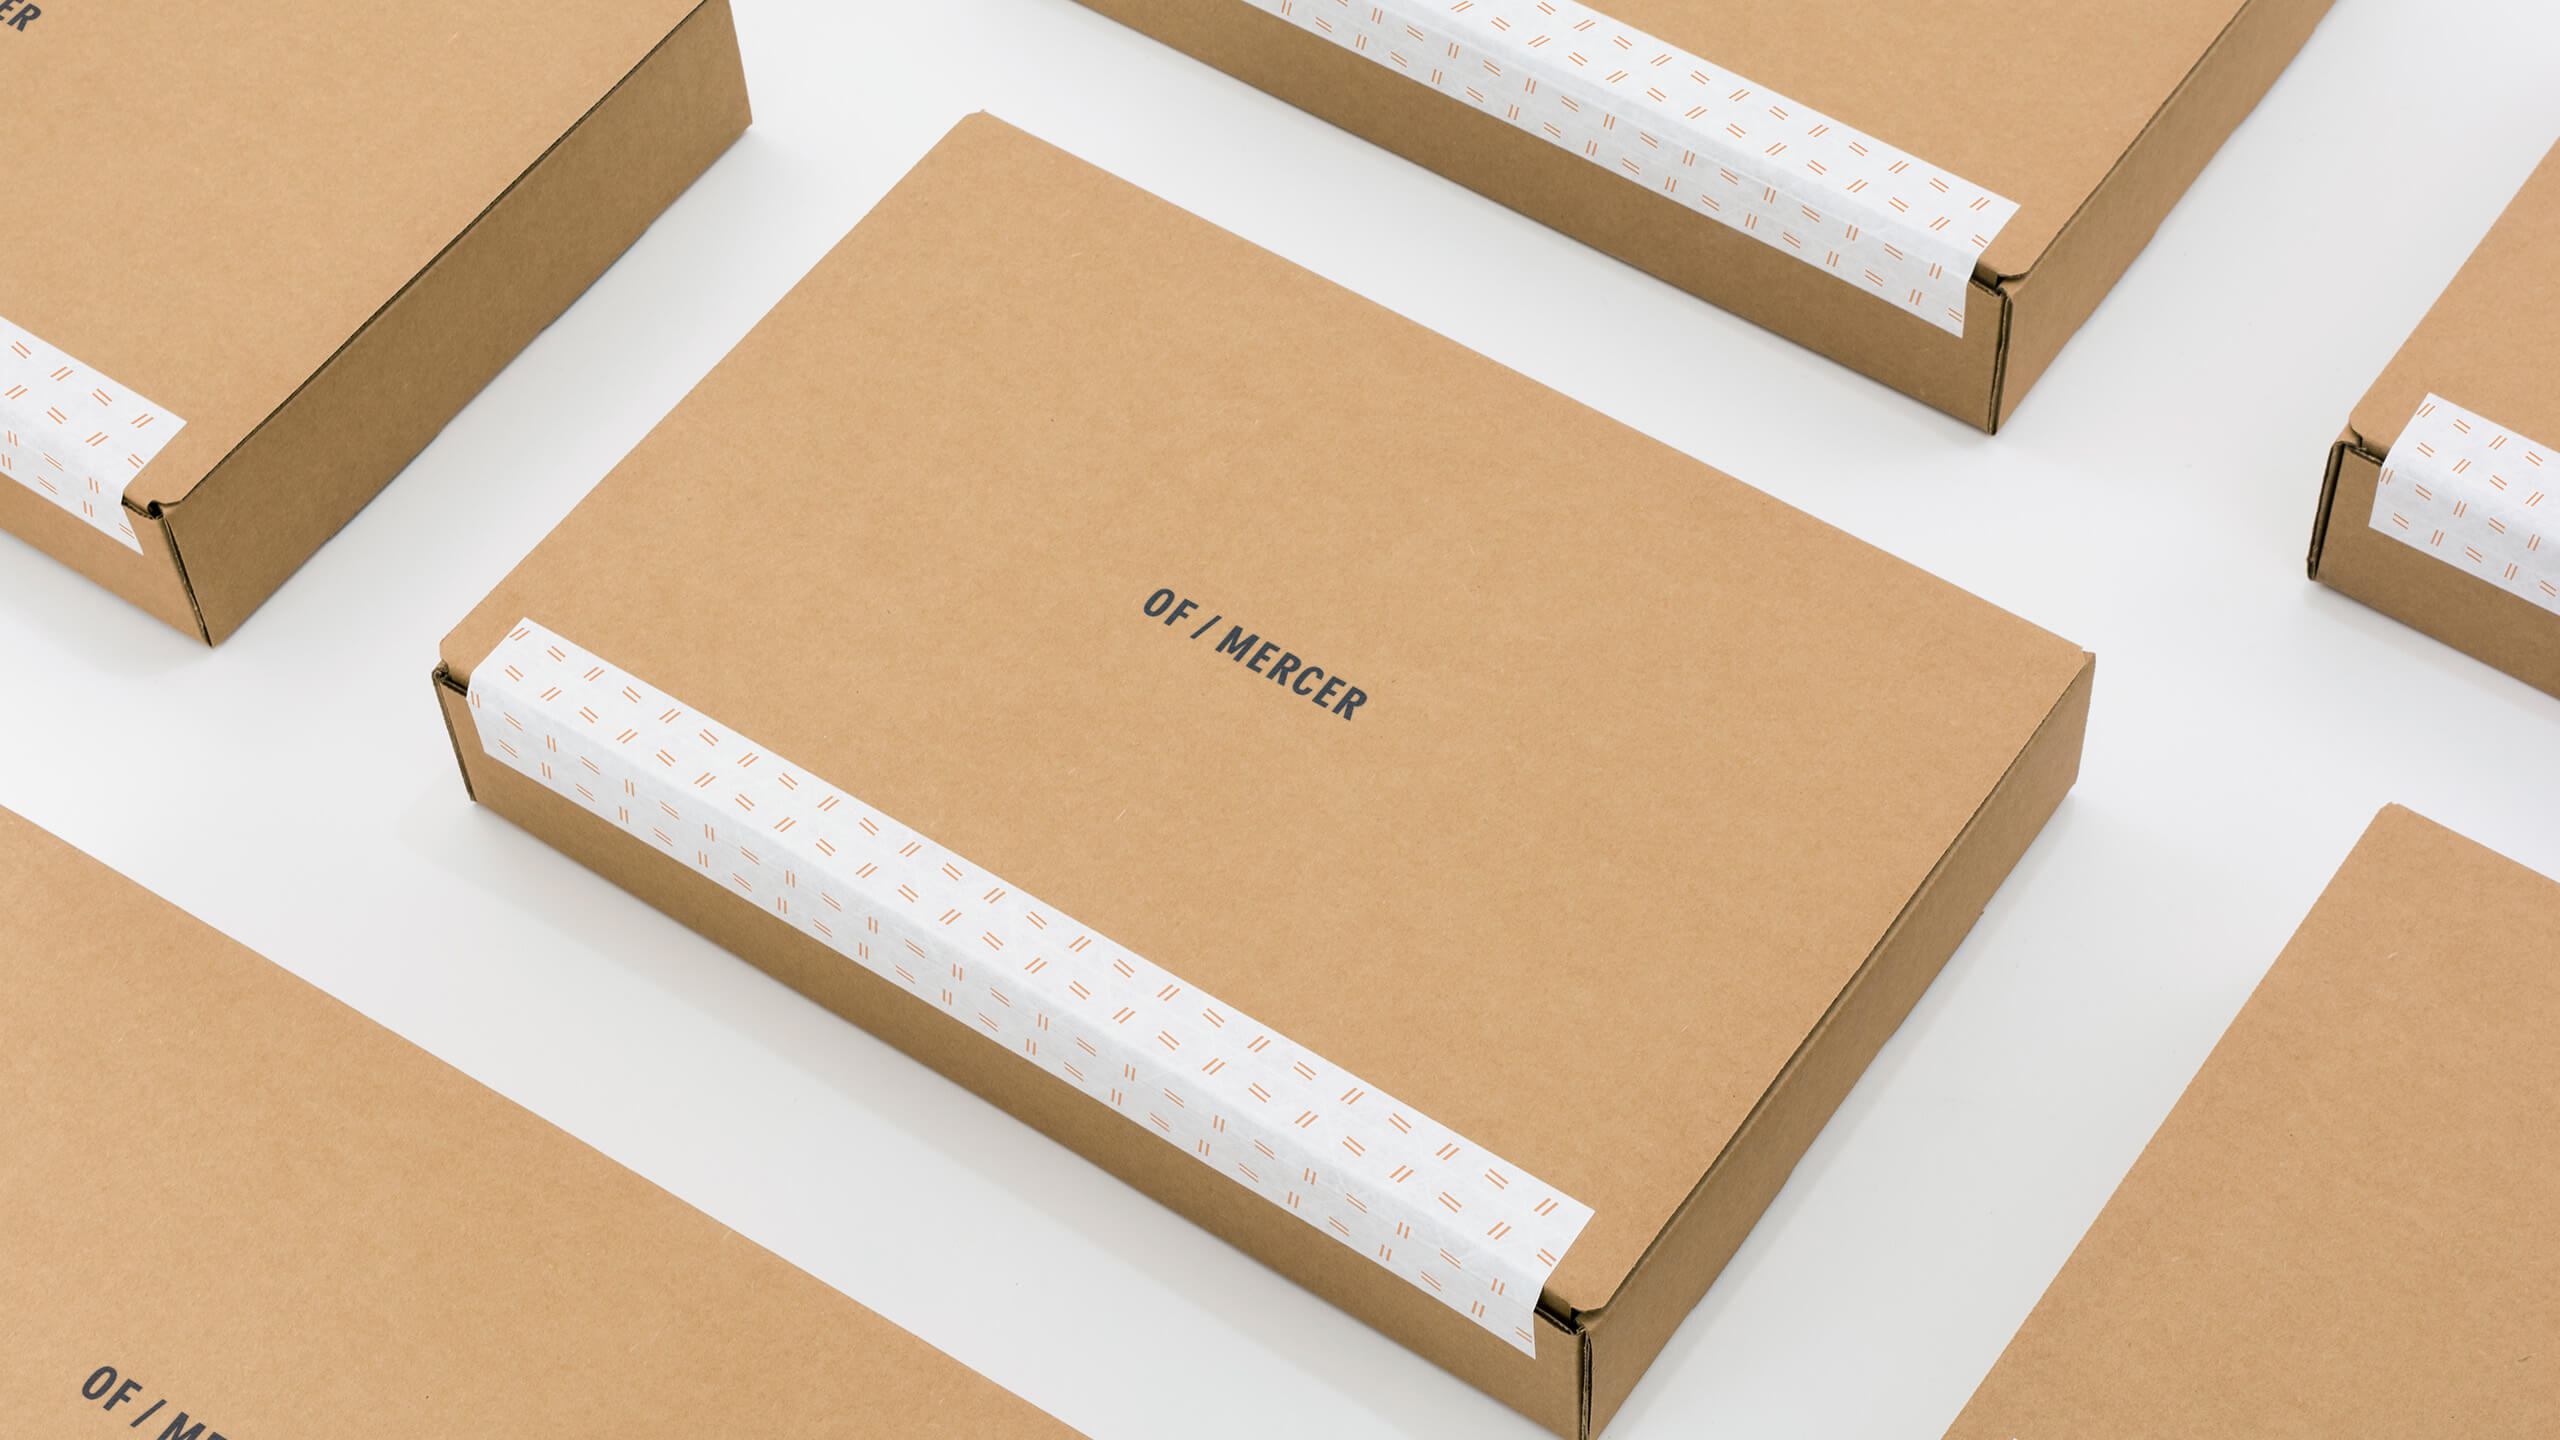 bueno-ofmercer-boxes